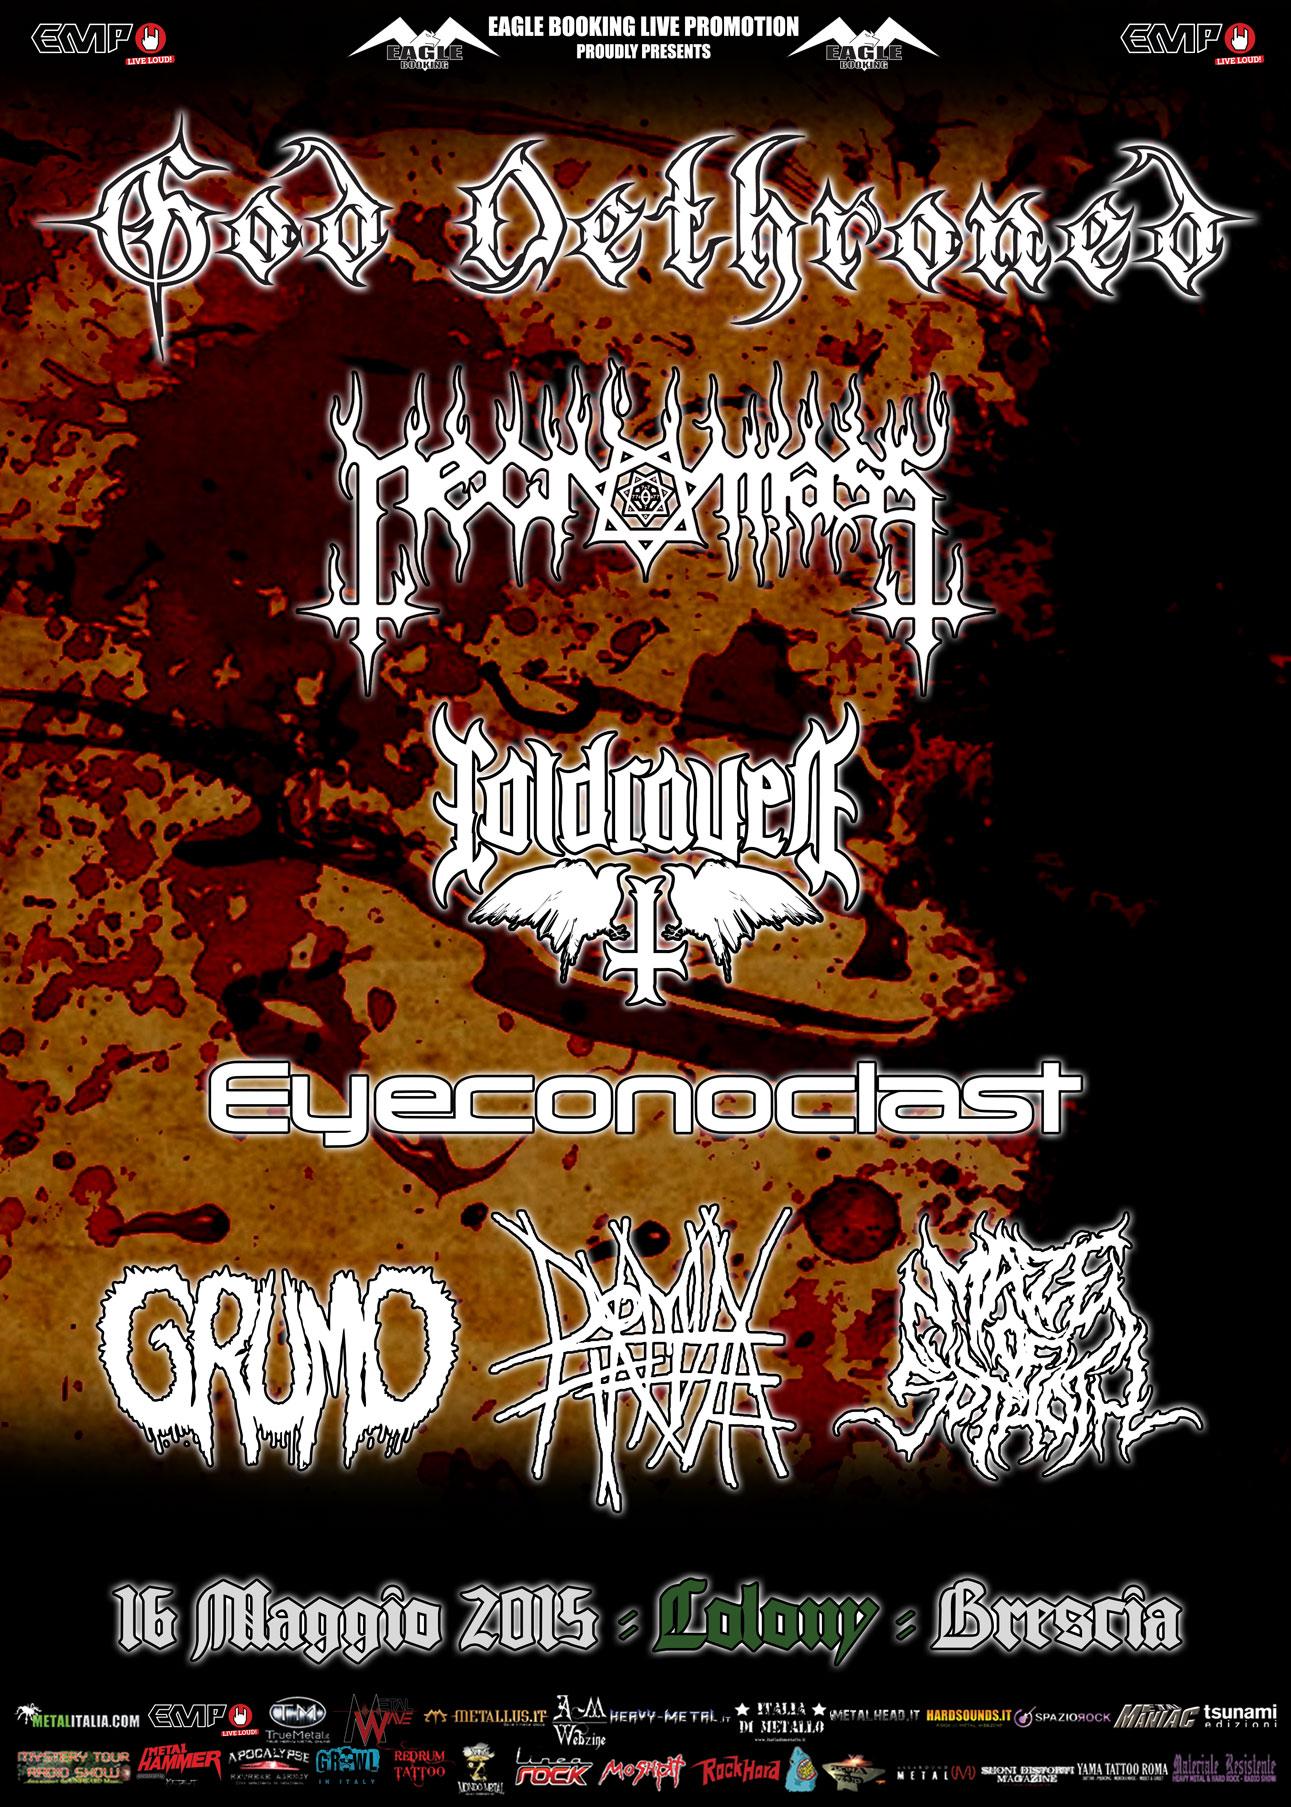 God Detroned Necromass Promo web 2015